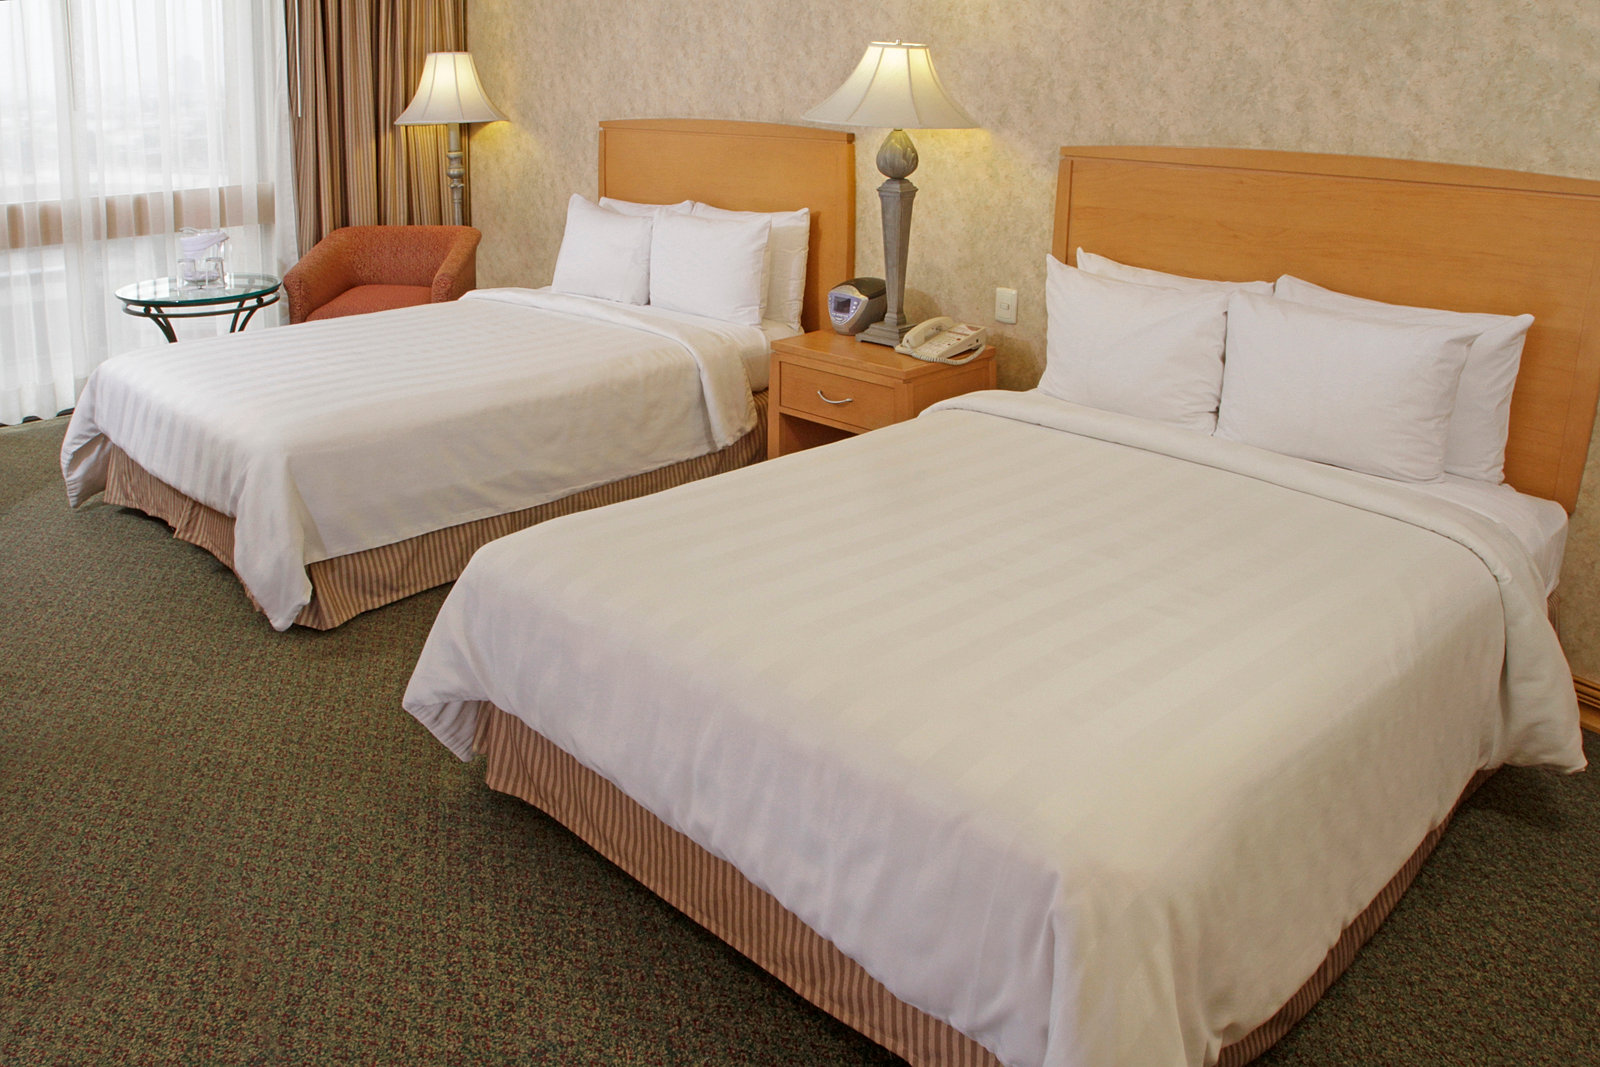 Hoteles milenium habitaci n est ndar 2 camas for Camas de 1 20